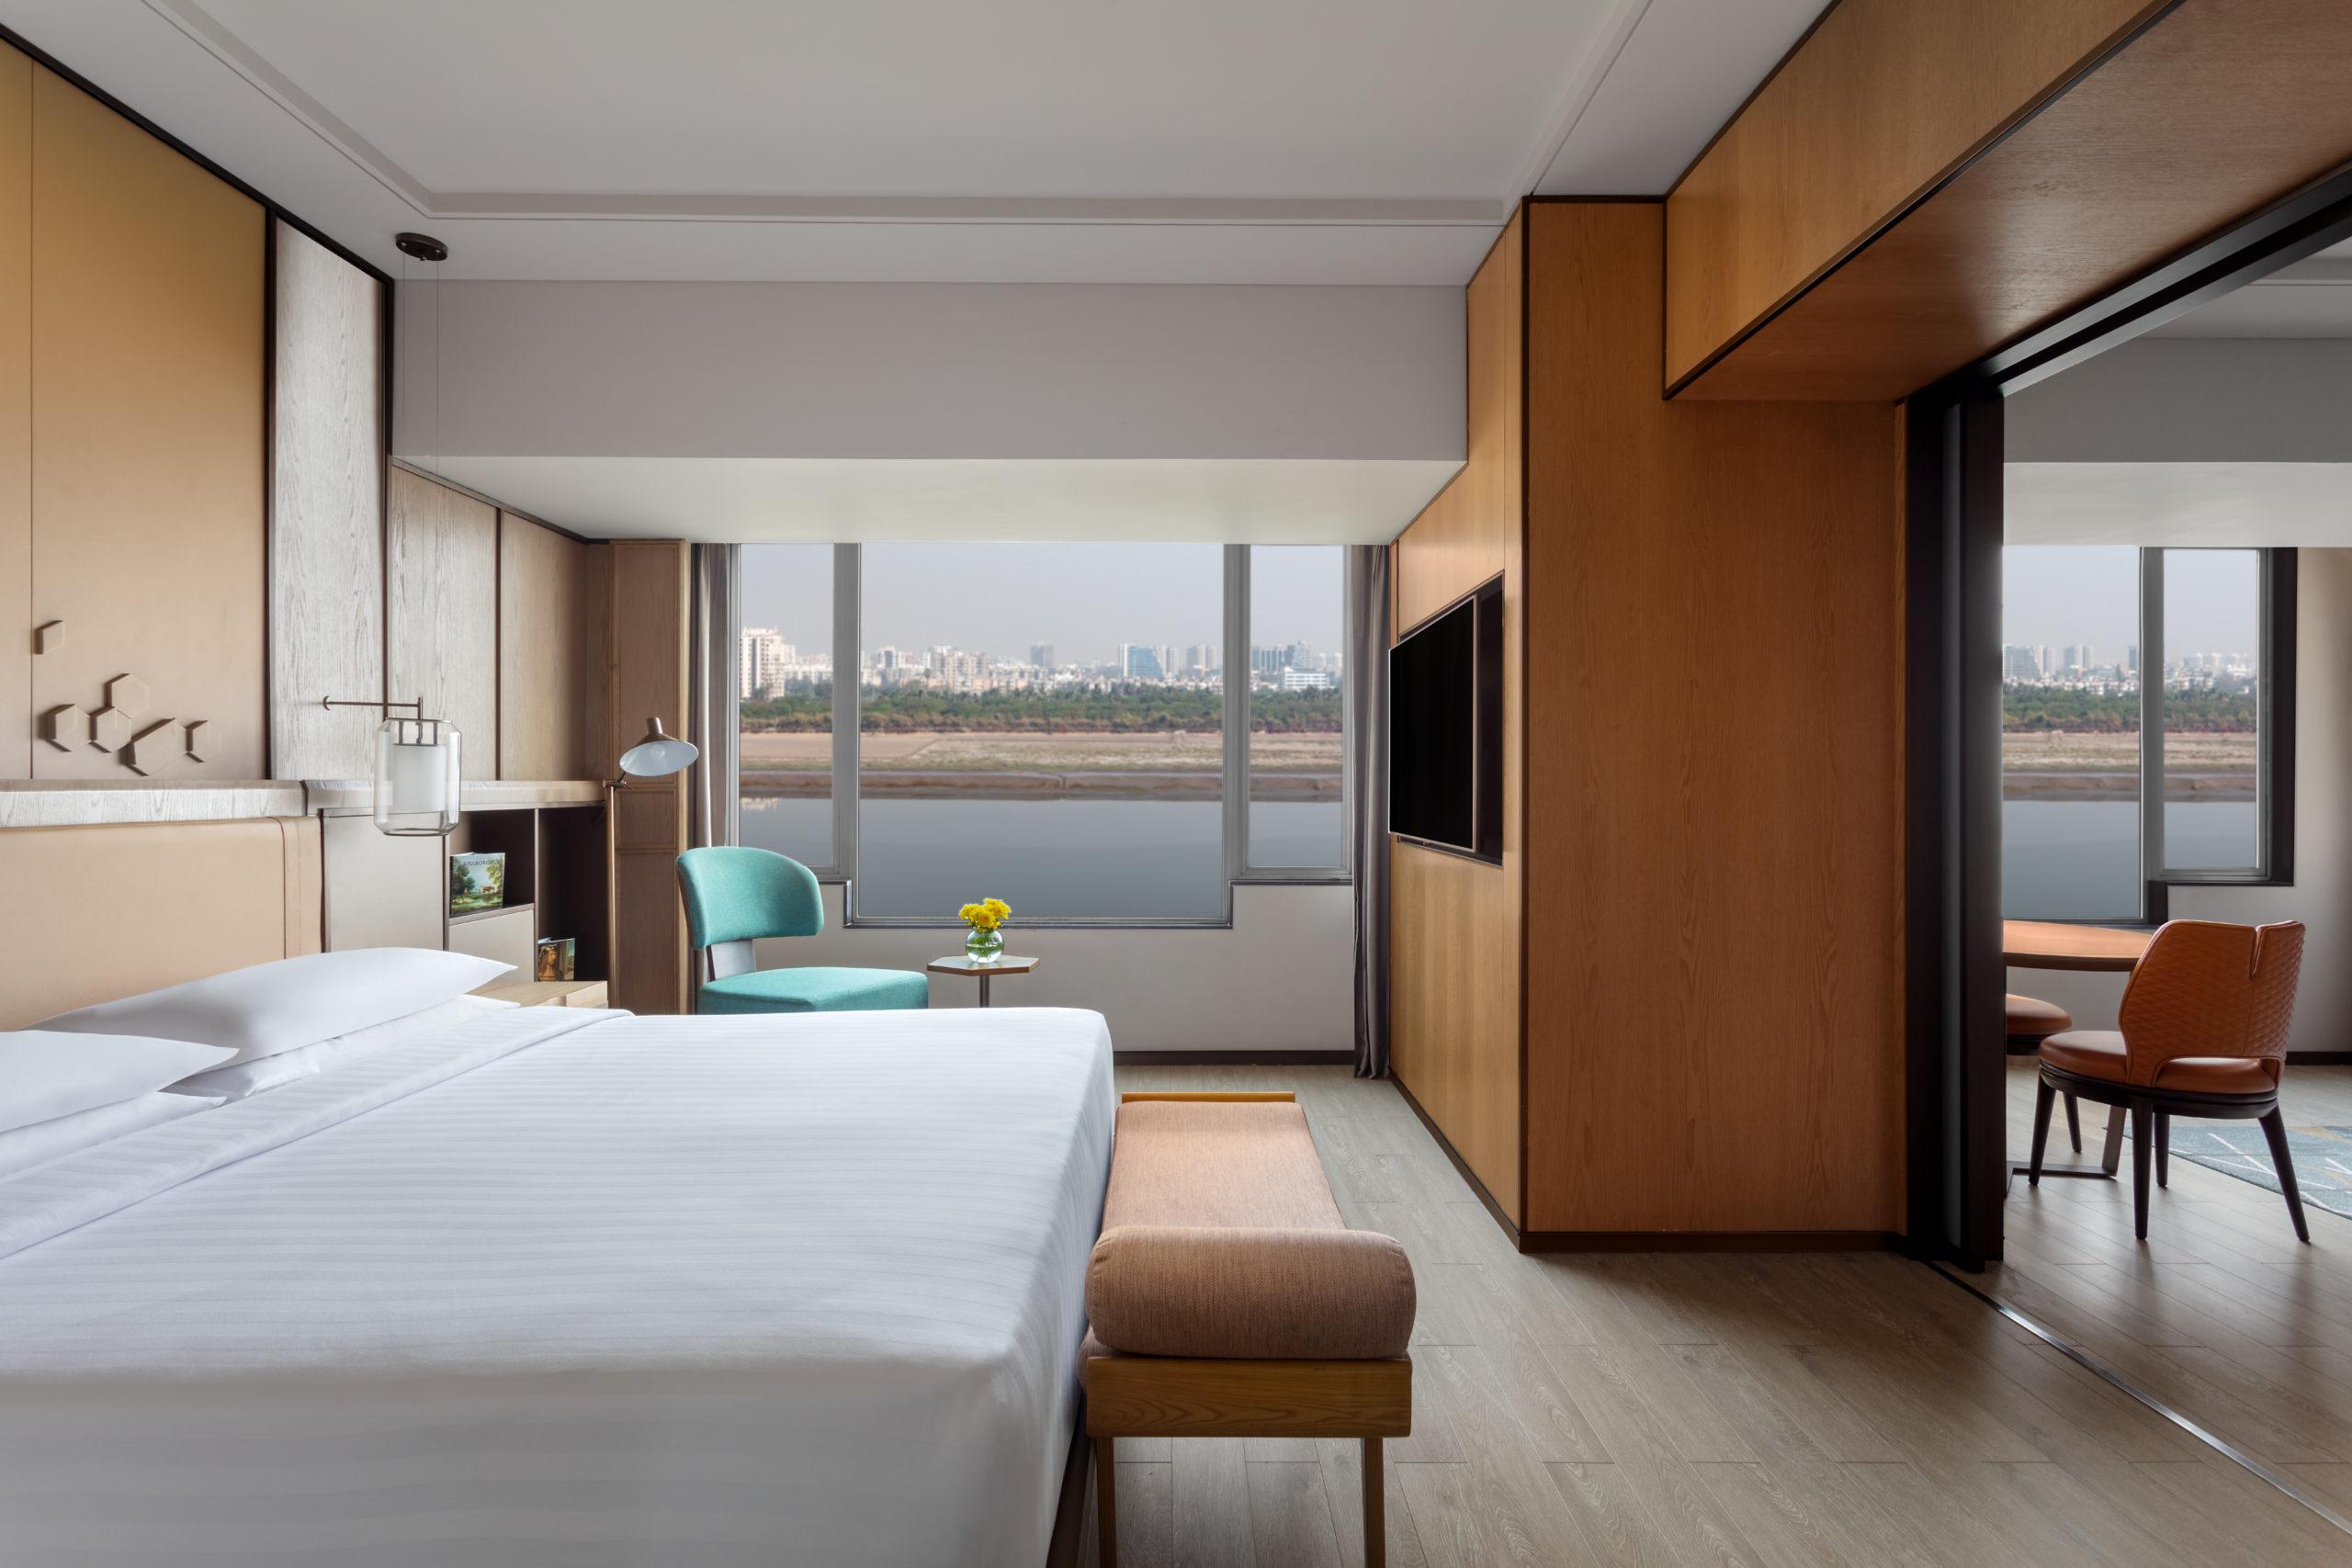 https://www.aurohotels.com/wp-content/uploads/MH_STVMC_grandluxe_suite_bedroom-scaled.jpg